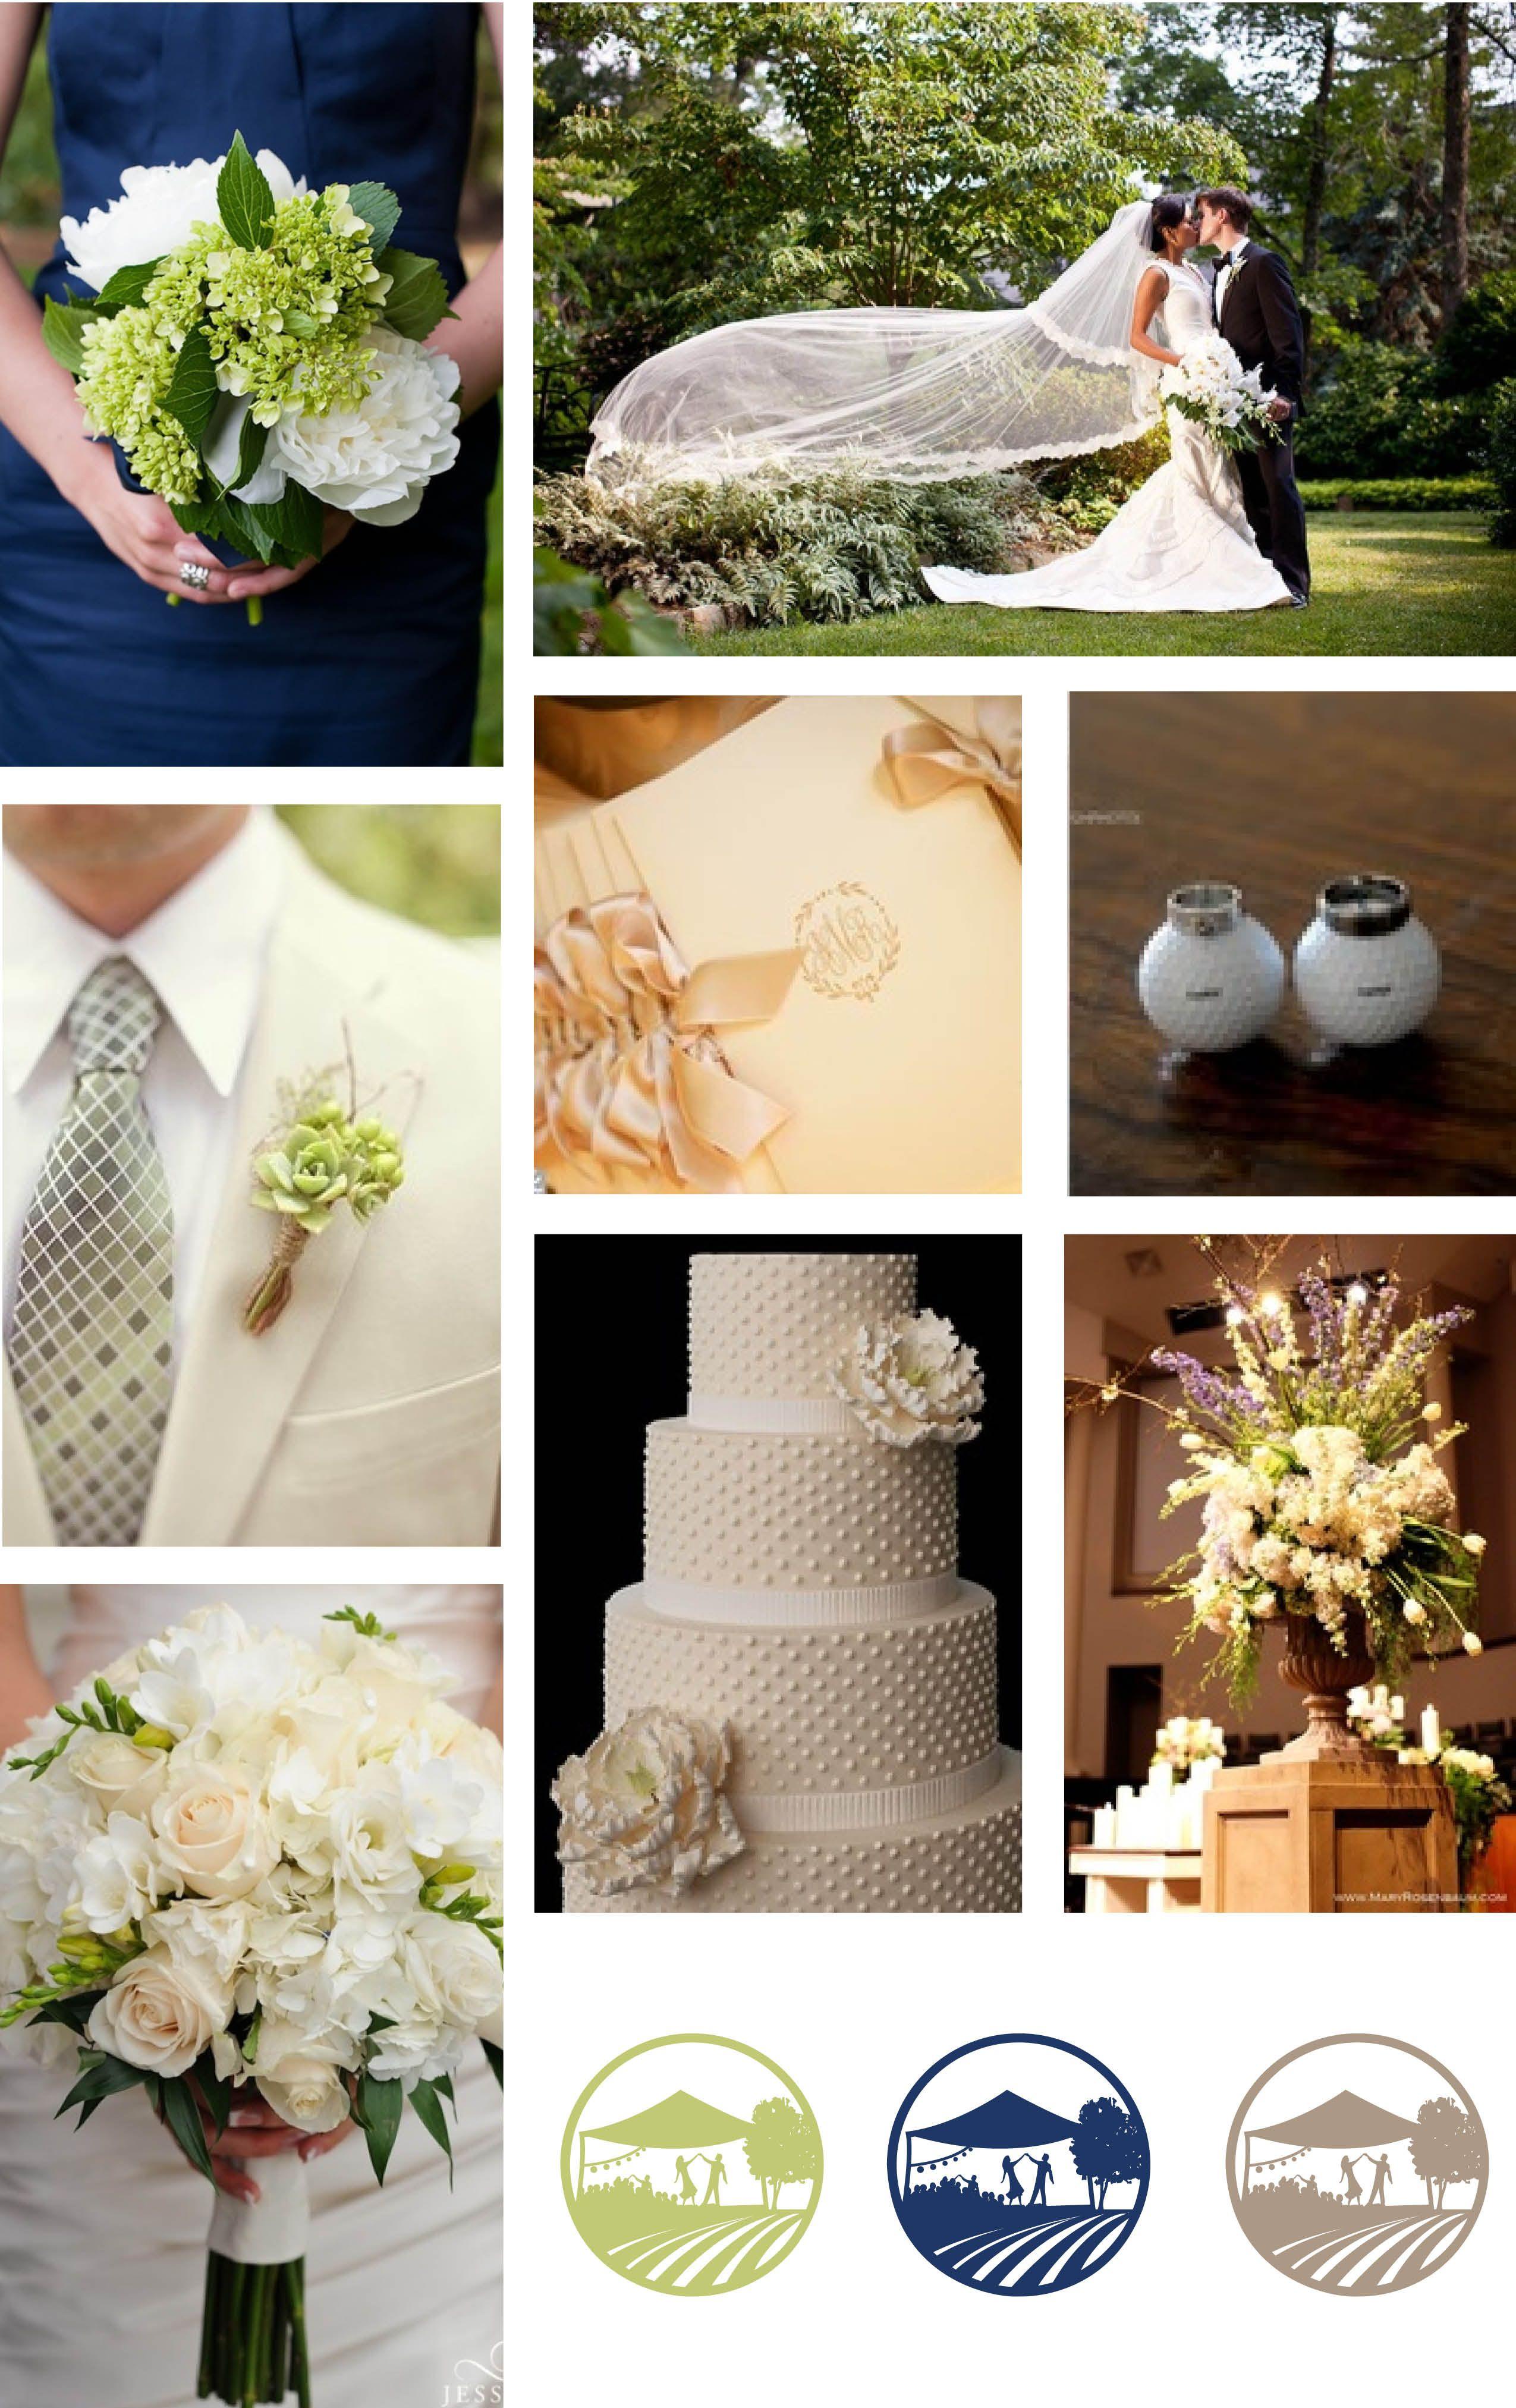 my wedding inspiration board - traditional southern elegance